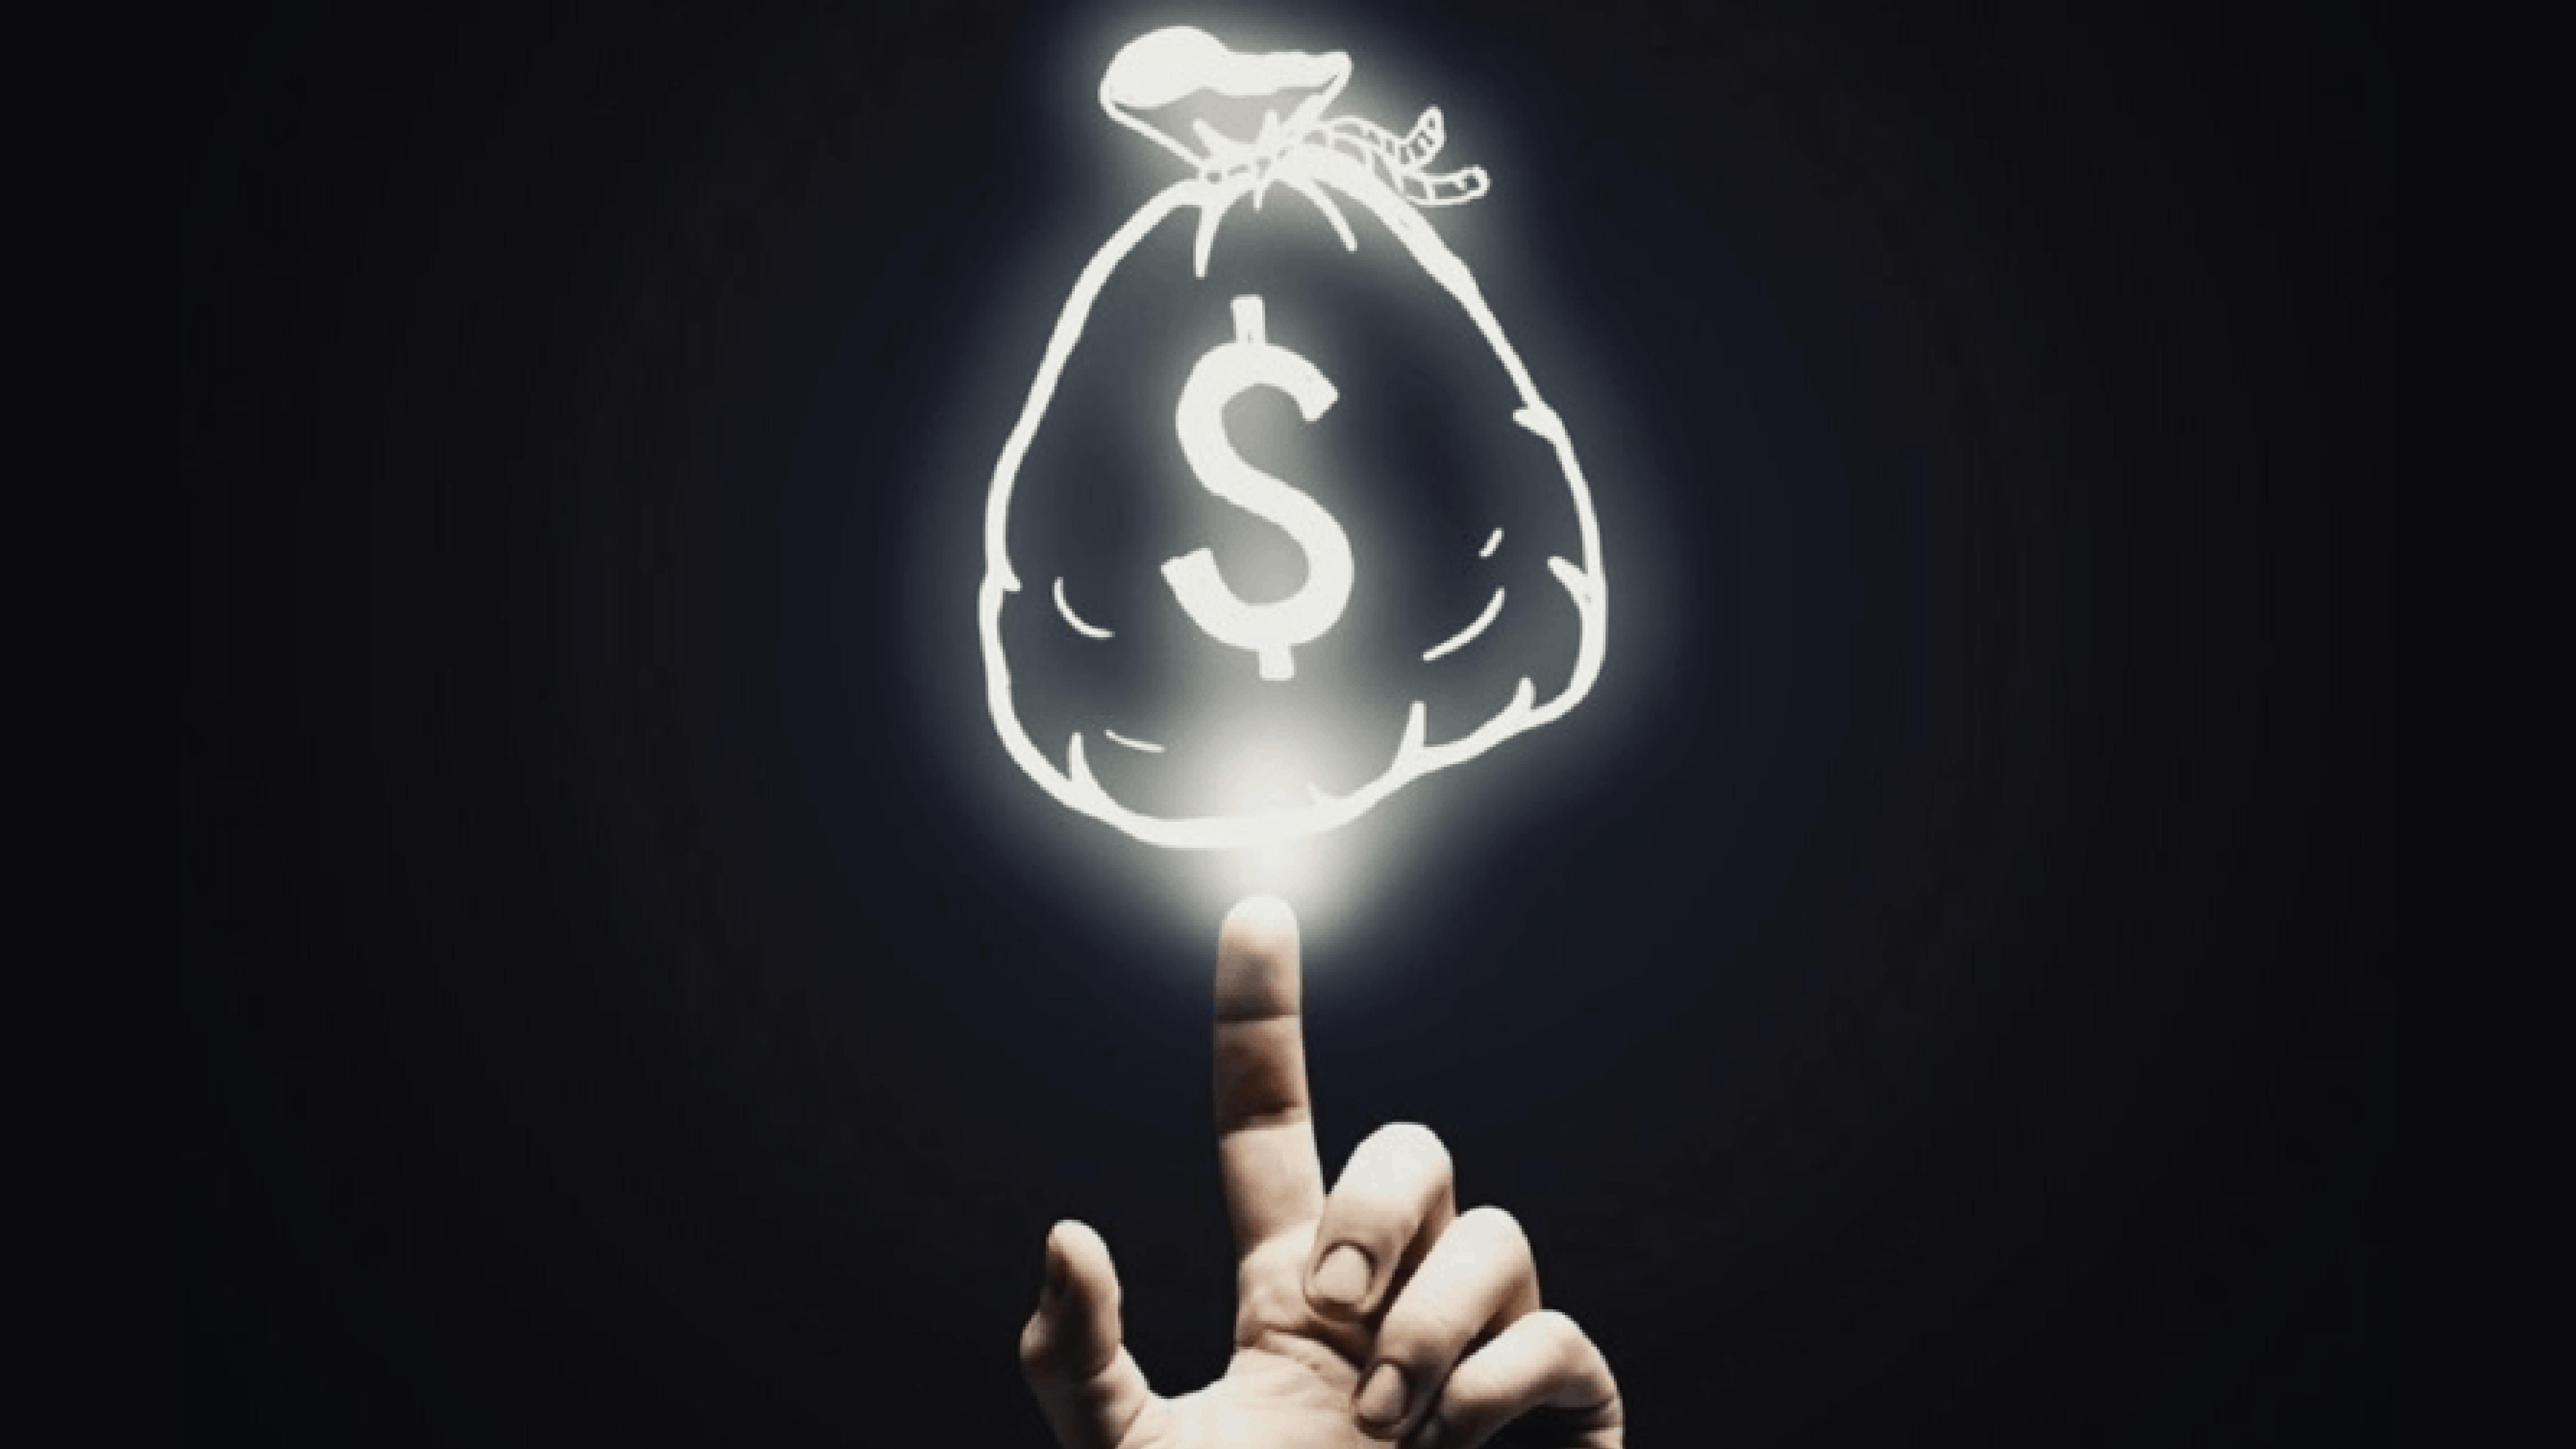 How can Fidelity BrokerageLink® help your 403(b) retirement account?